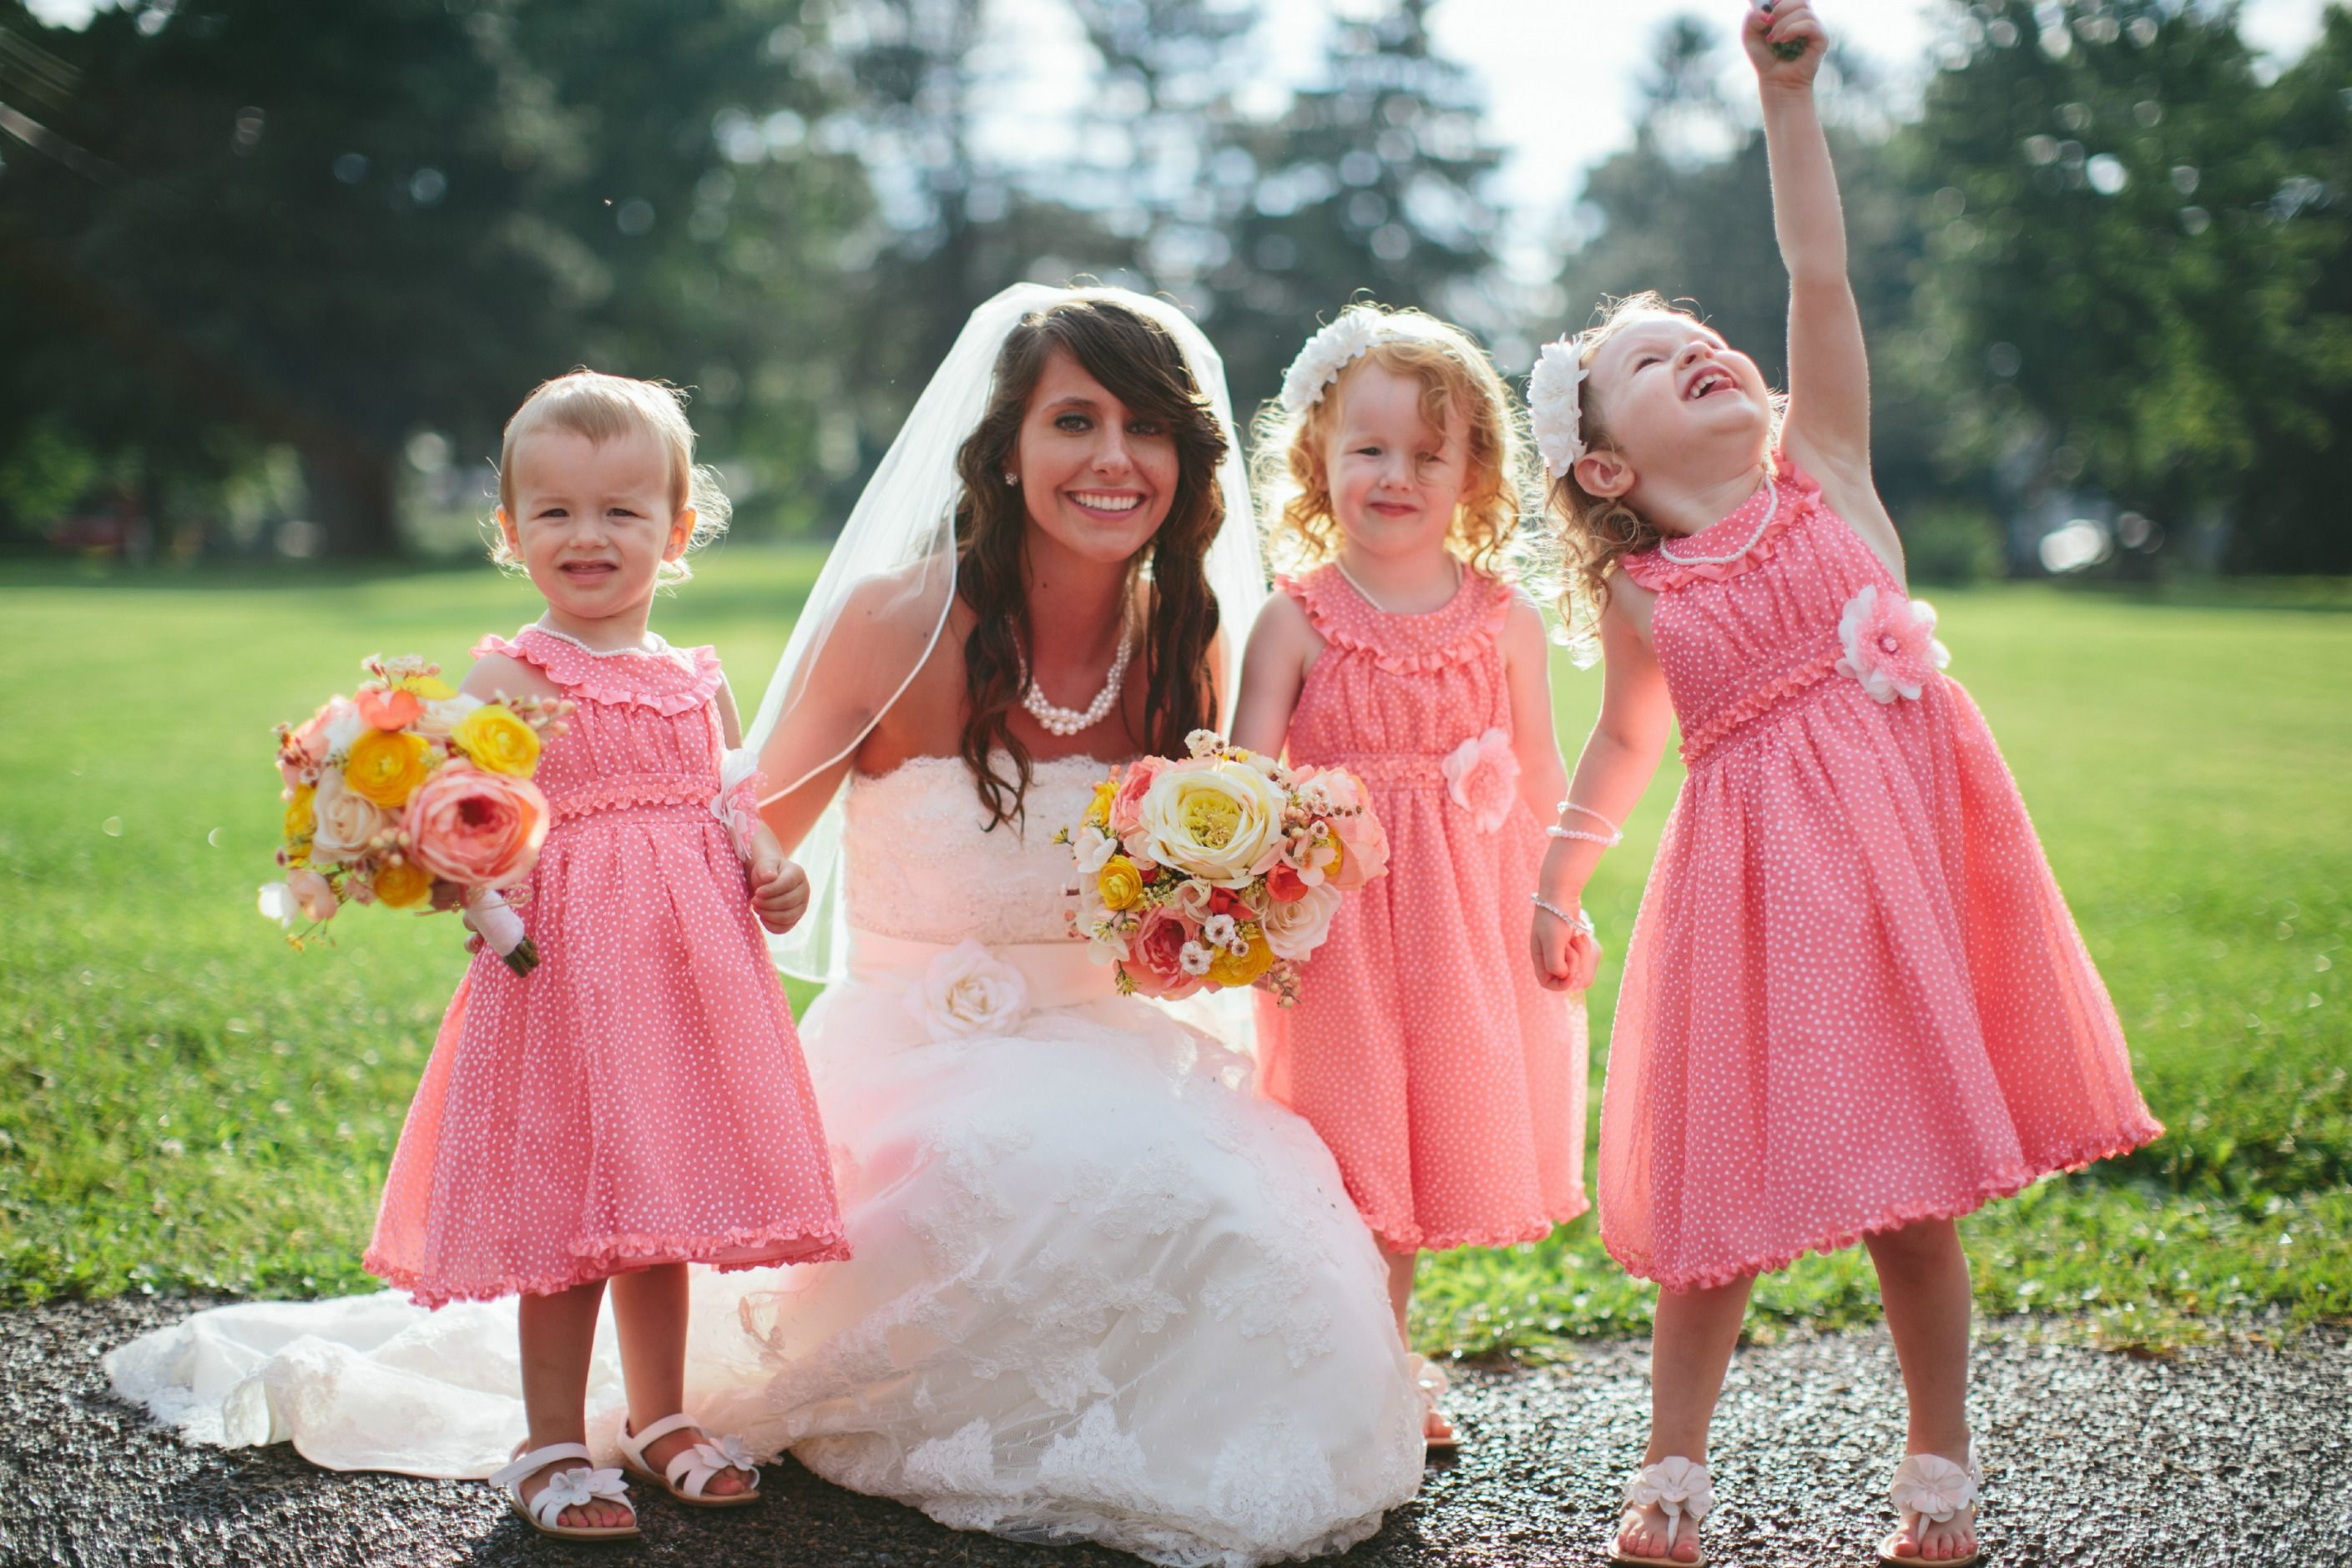 Flower S C Gray Wedding Rustic Dress Bride